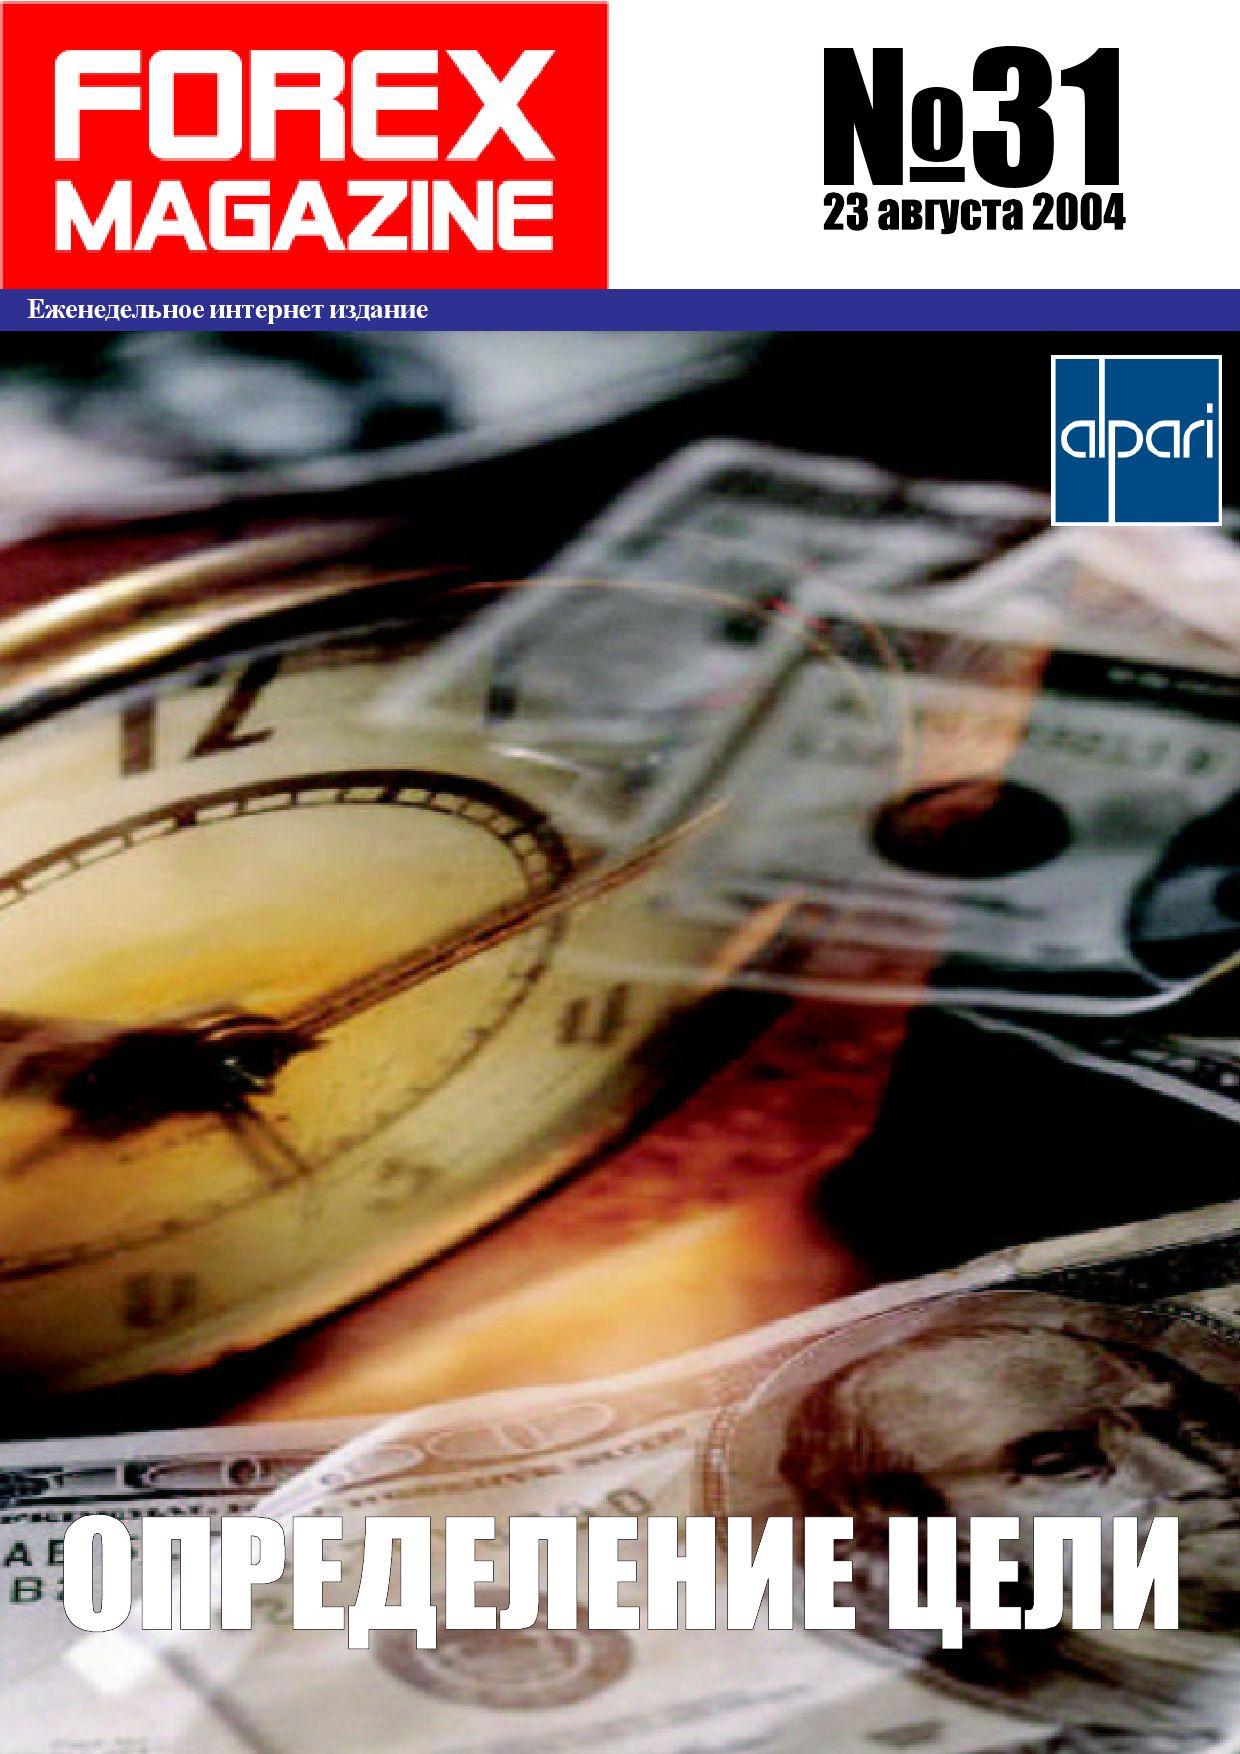 E forex magazine pdf